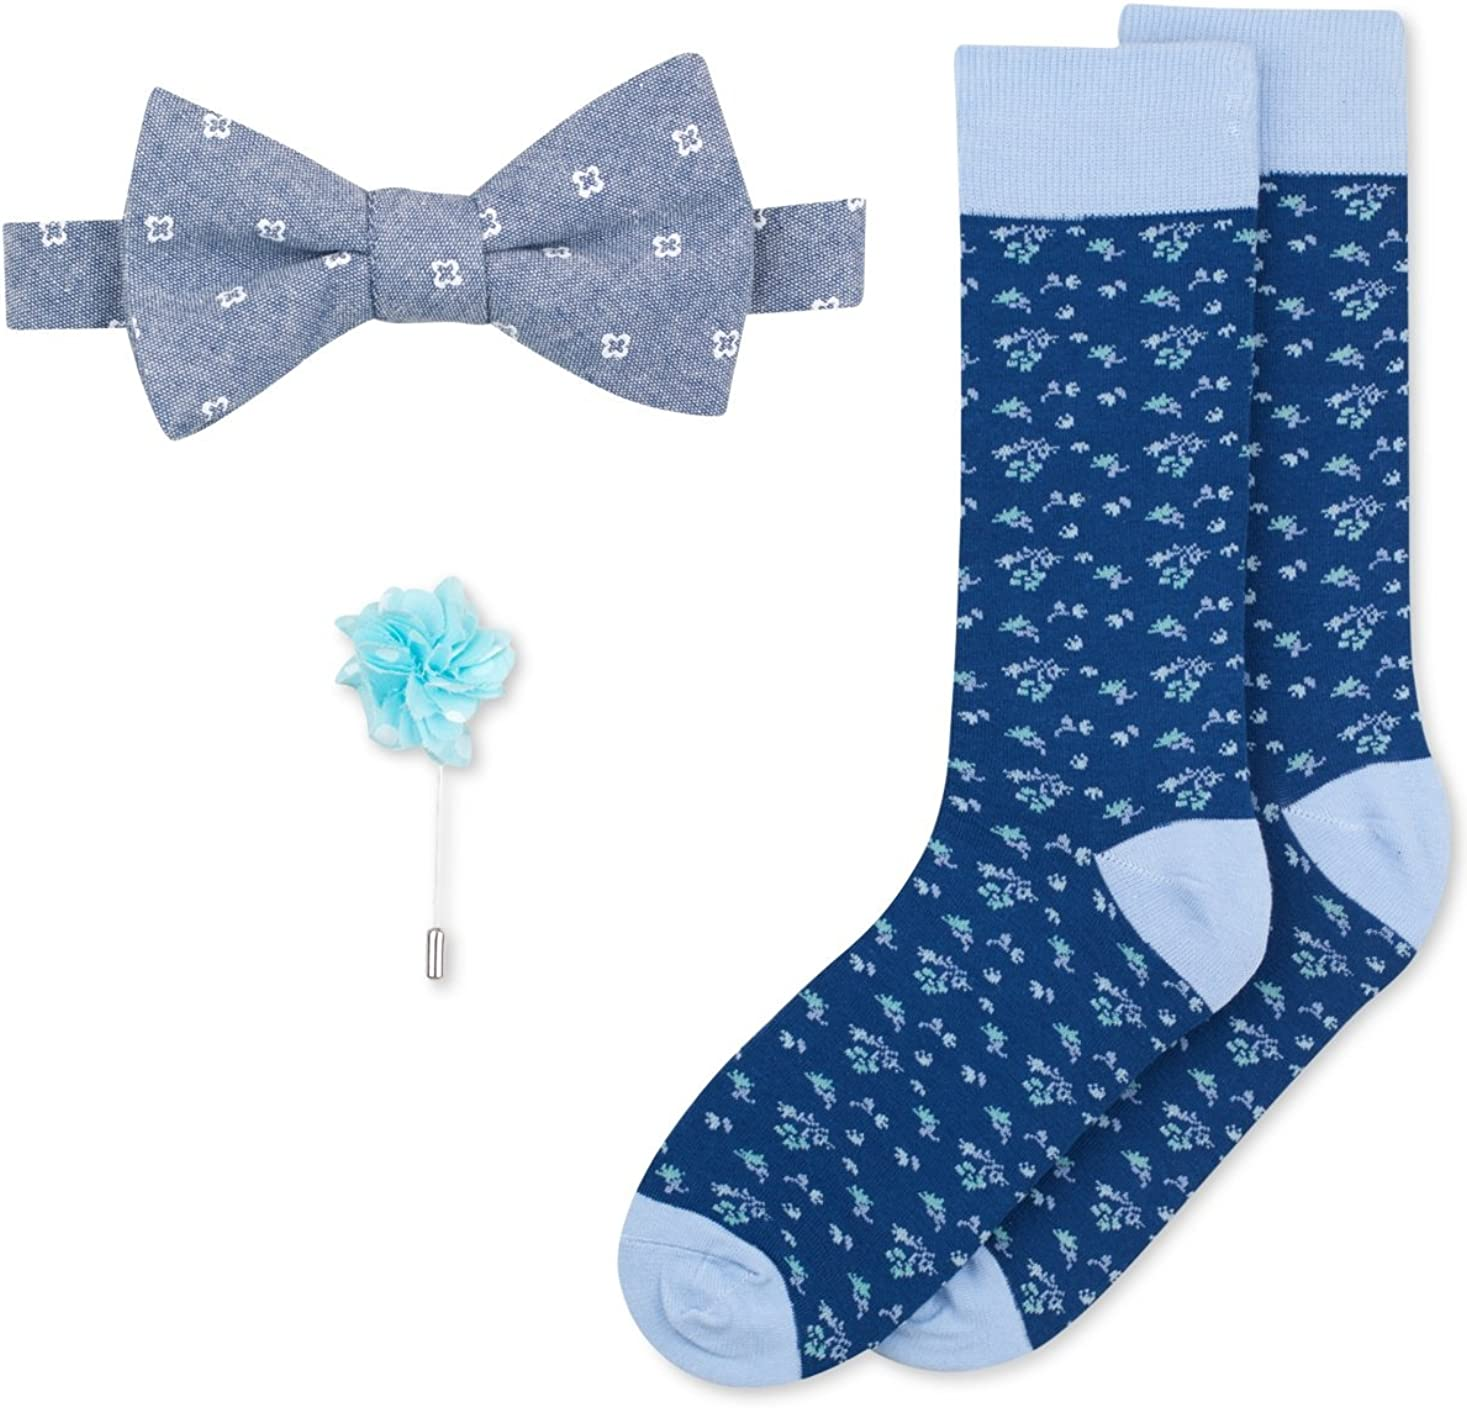 Bar III Men's Bow Tie, Lapel Pin & Socks Set